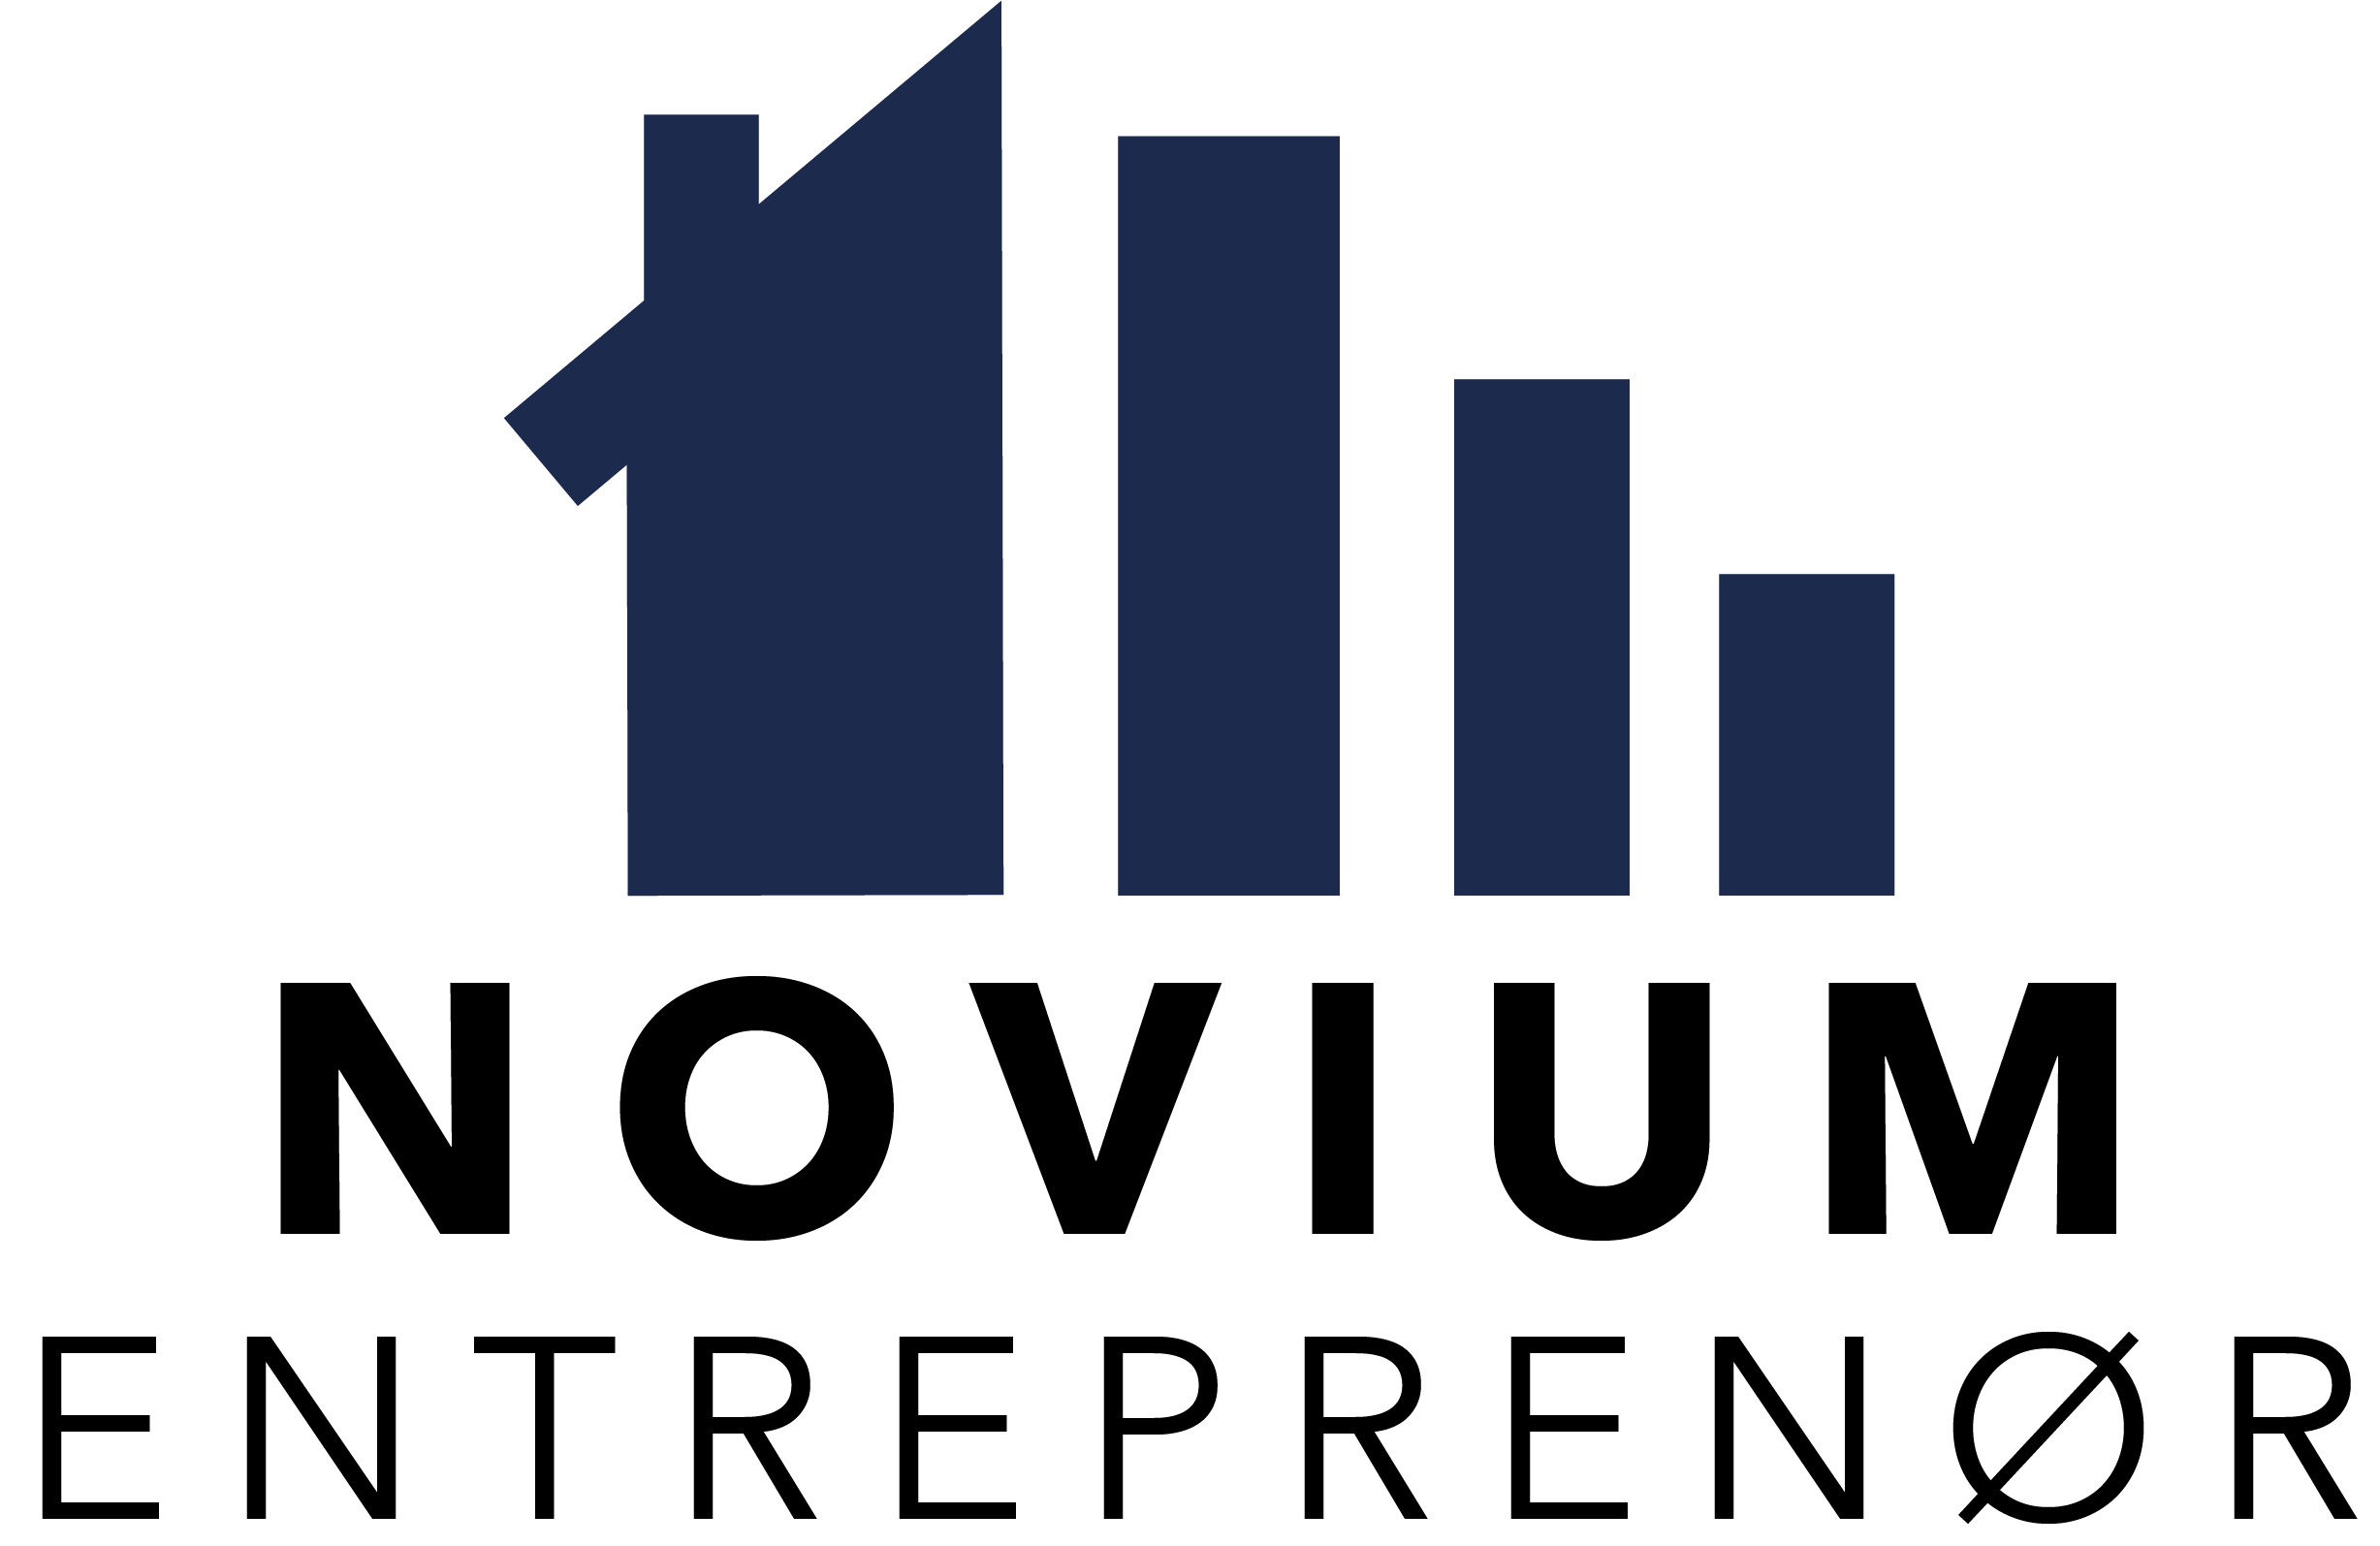 Novium sin logo